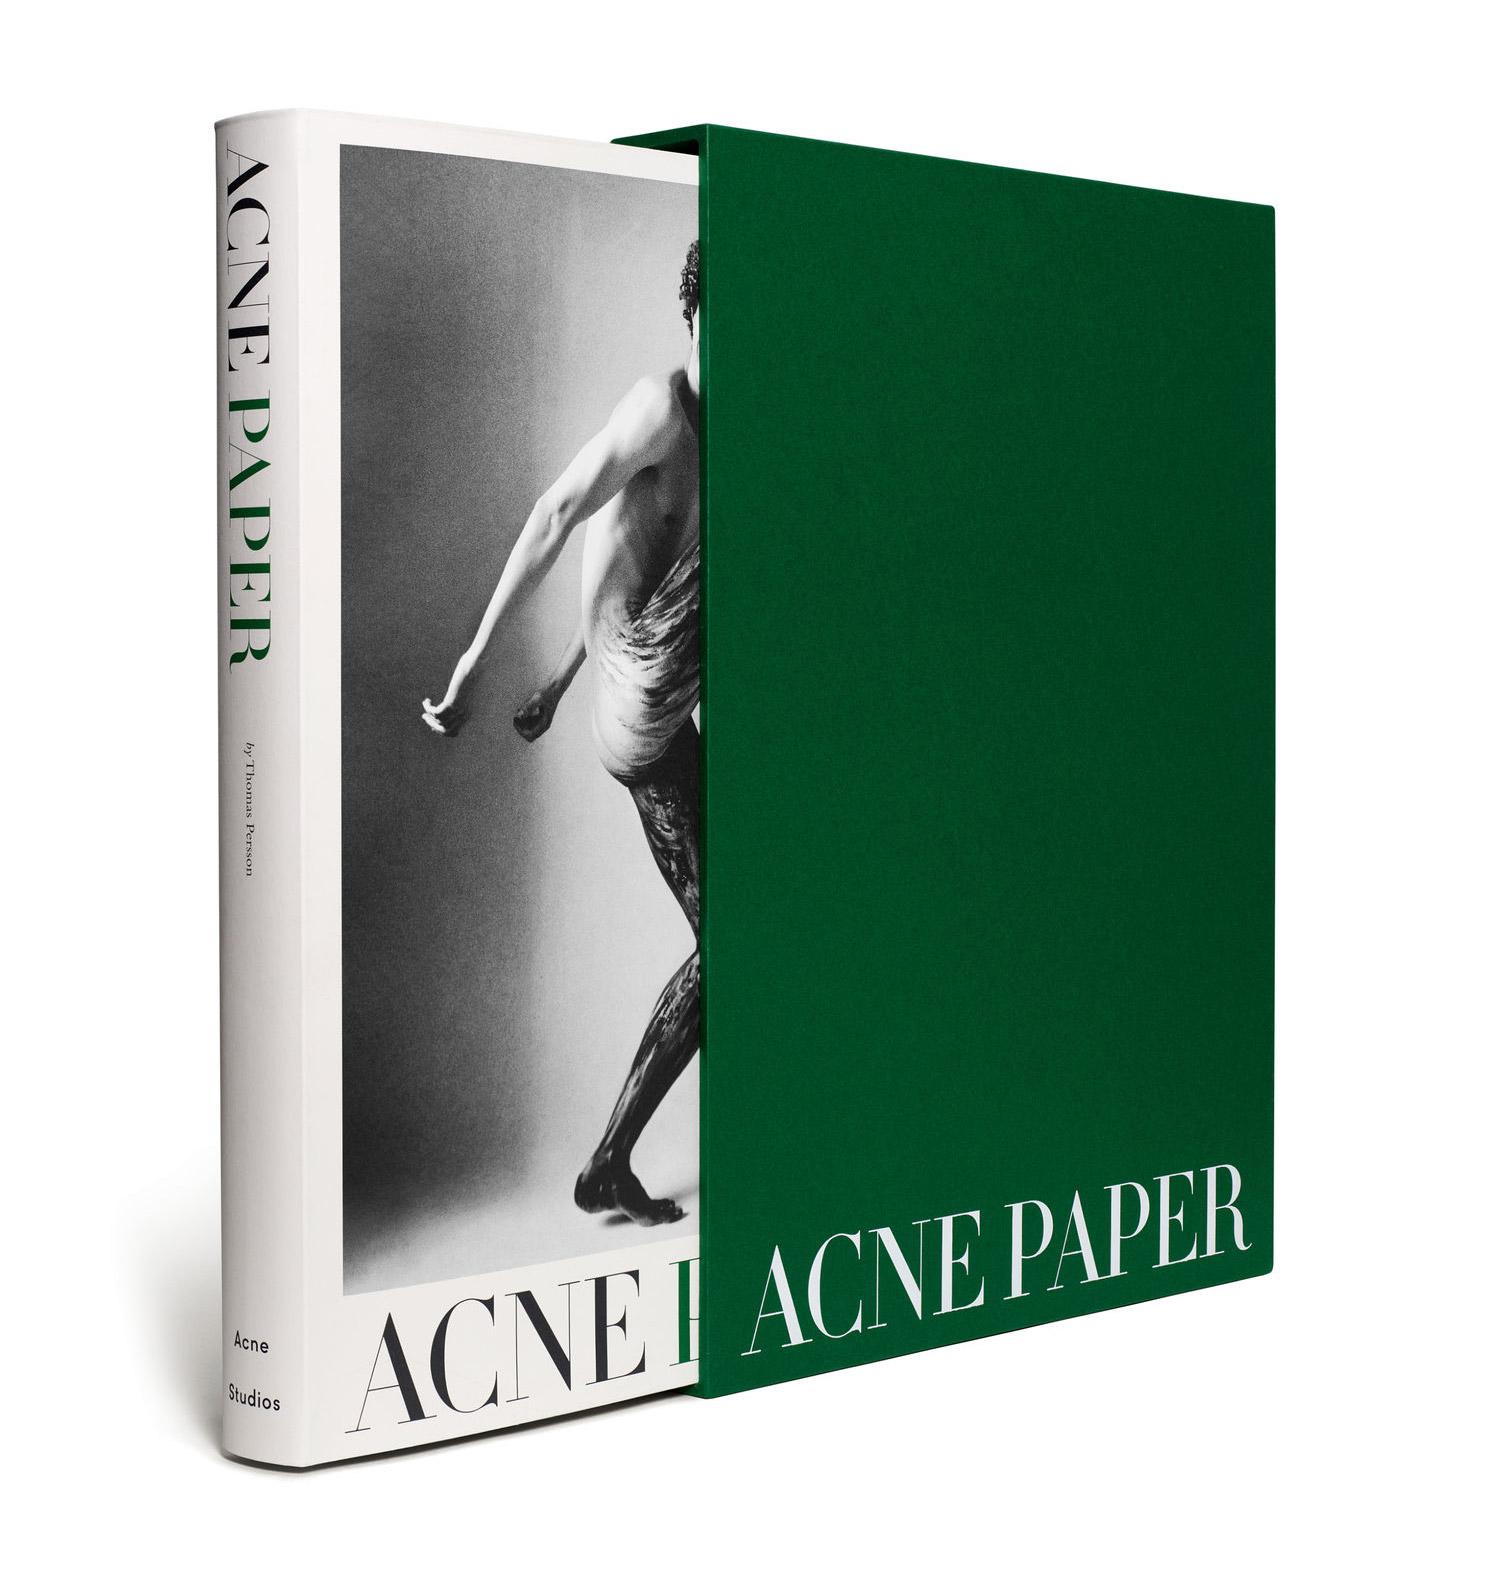 Acne Paper Book Cover